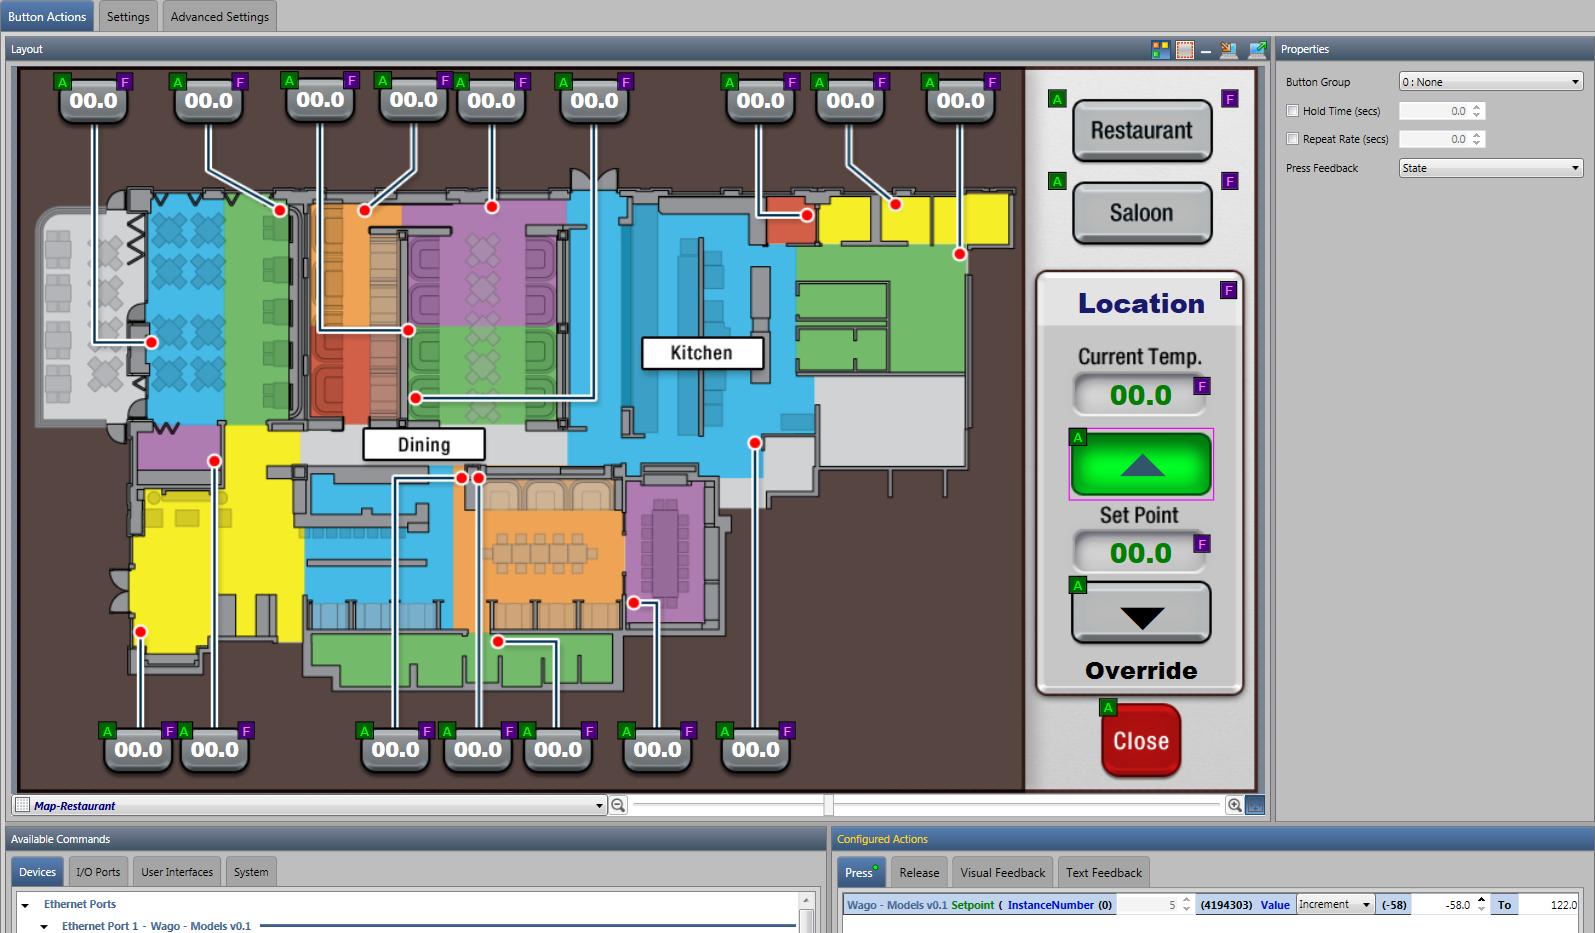 Bms System Diagram Excellent Electrical Wiring House Csdg Building Management Extron Riser Schematic